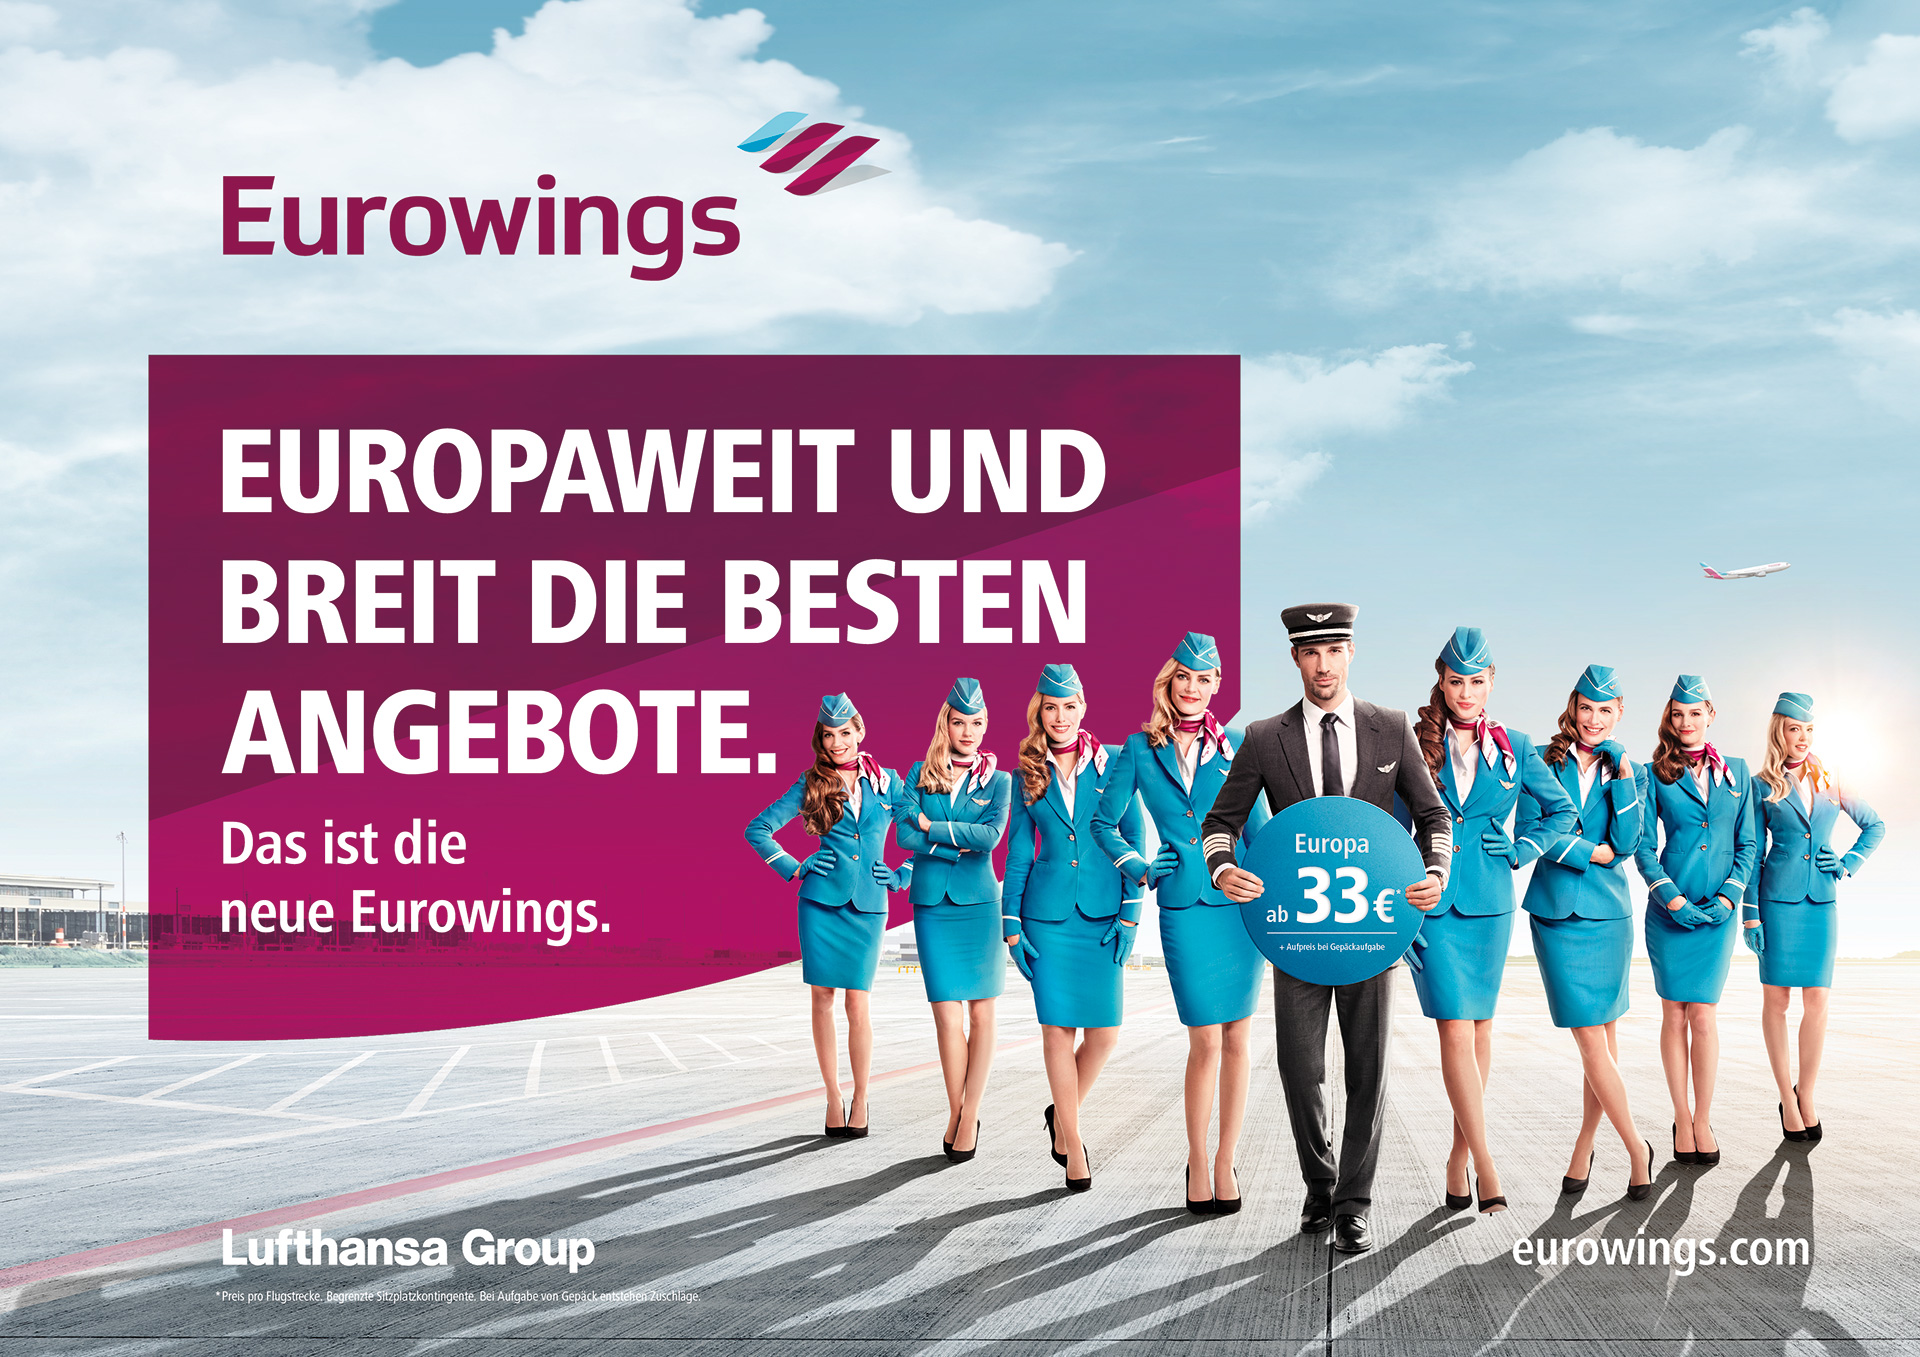 kerstin_correll_eurowings_1